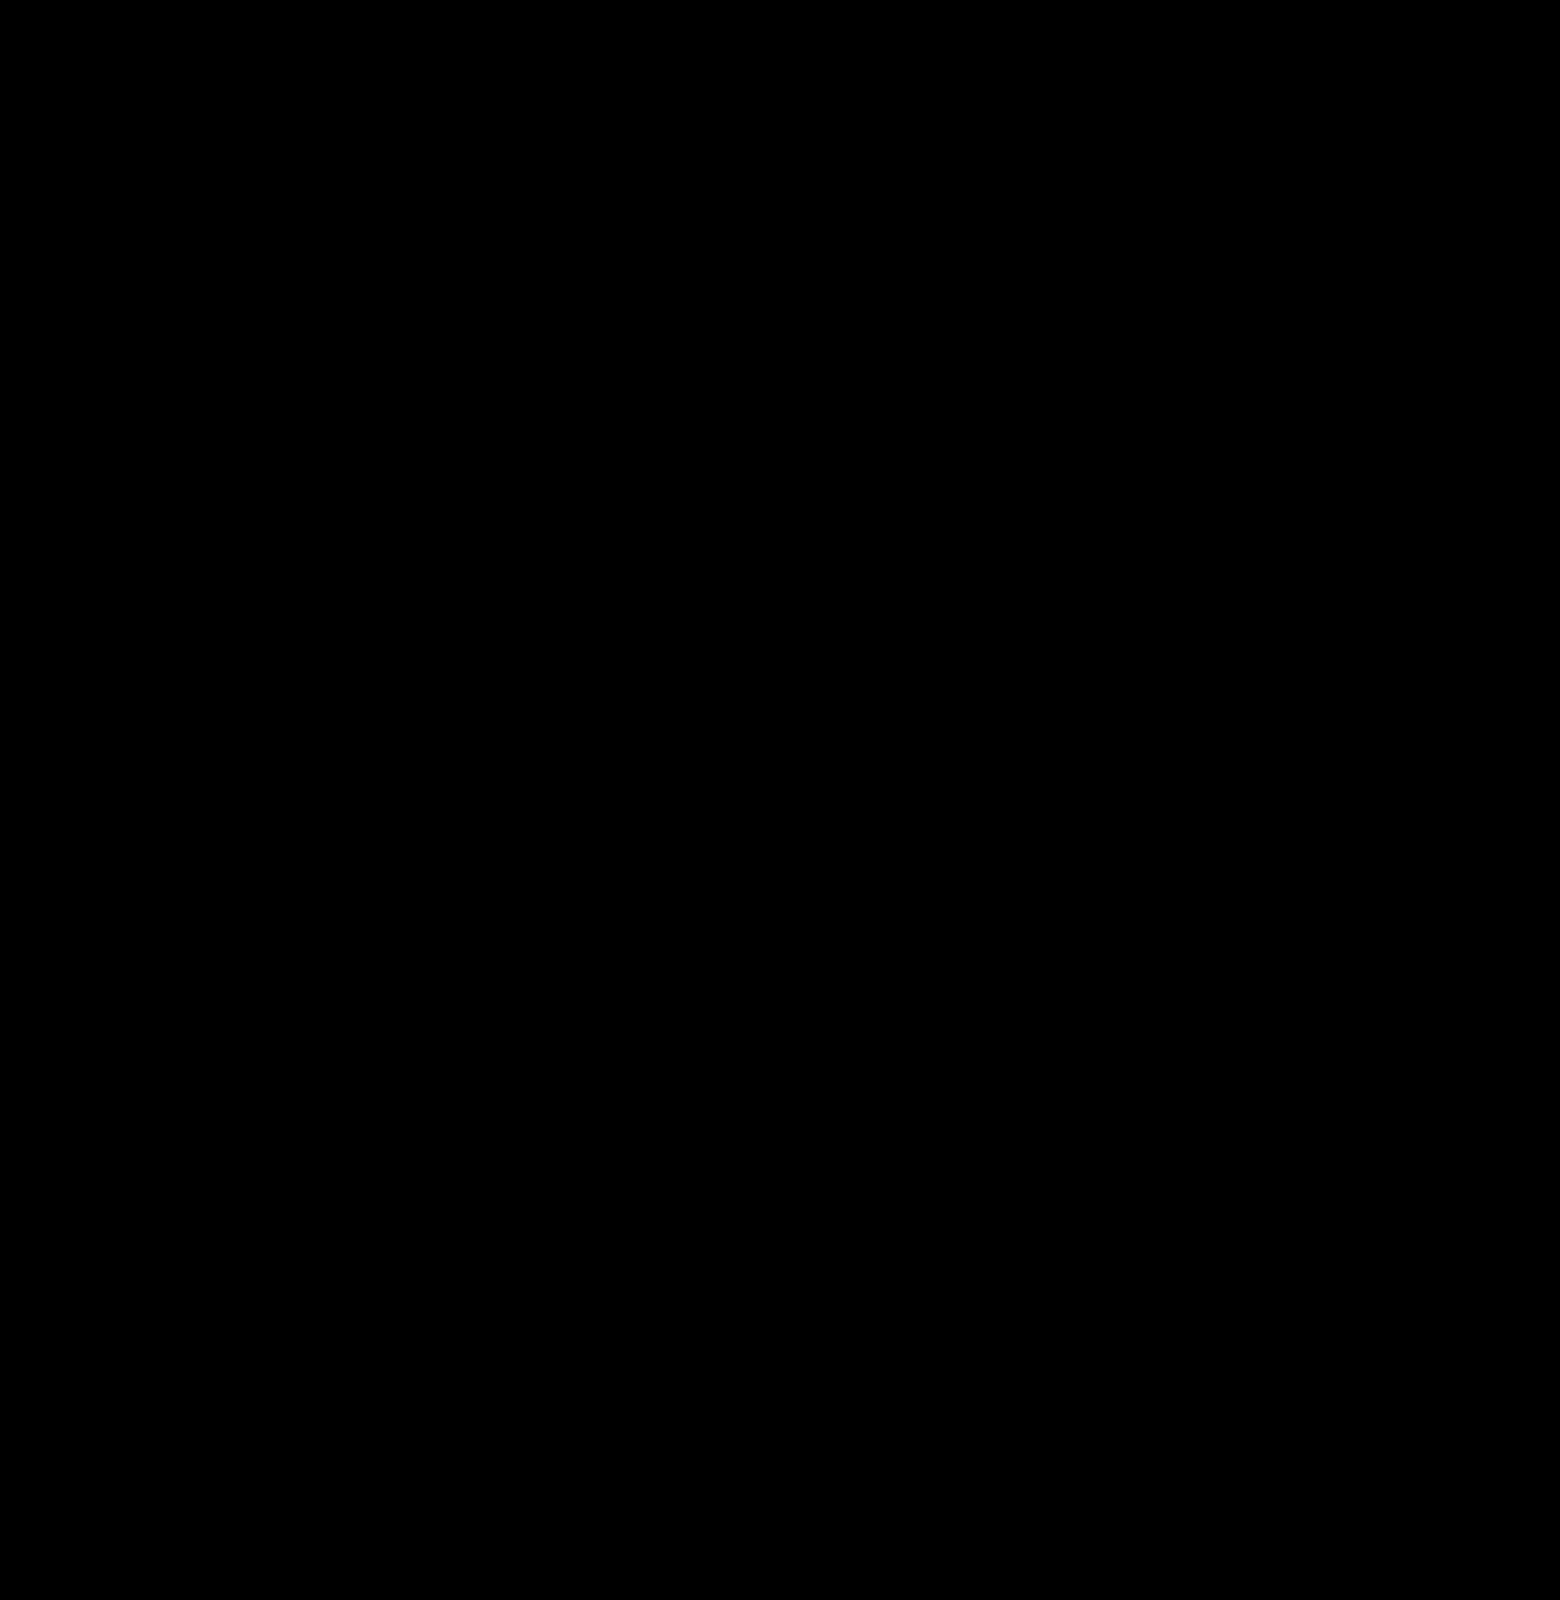 Fleur de lis symbol and sex